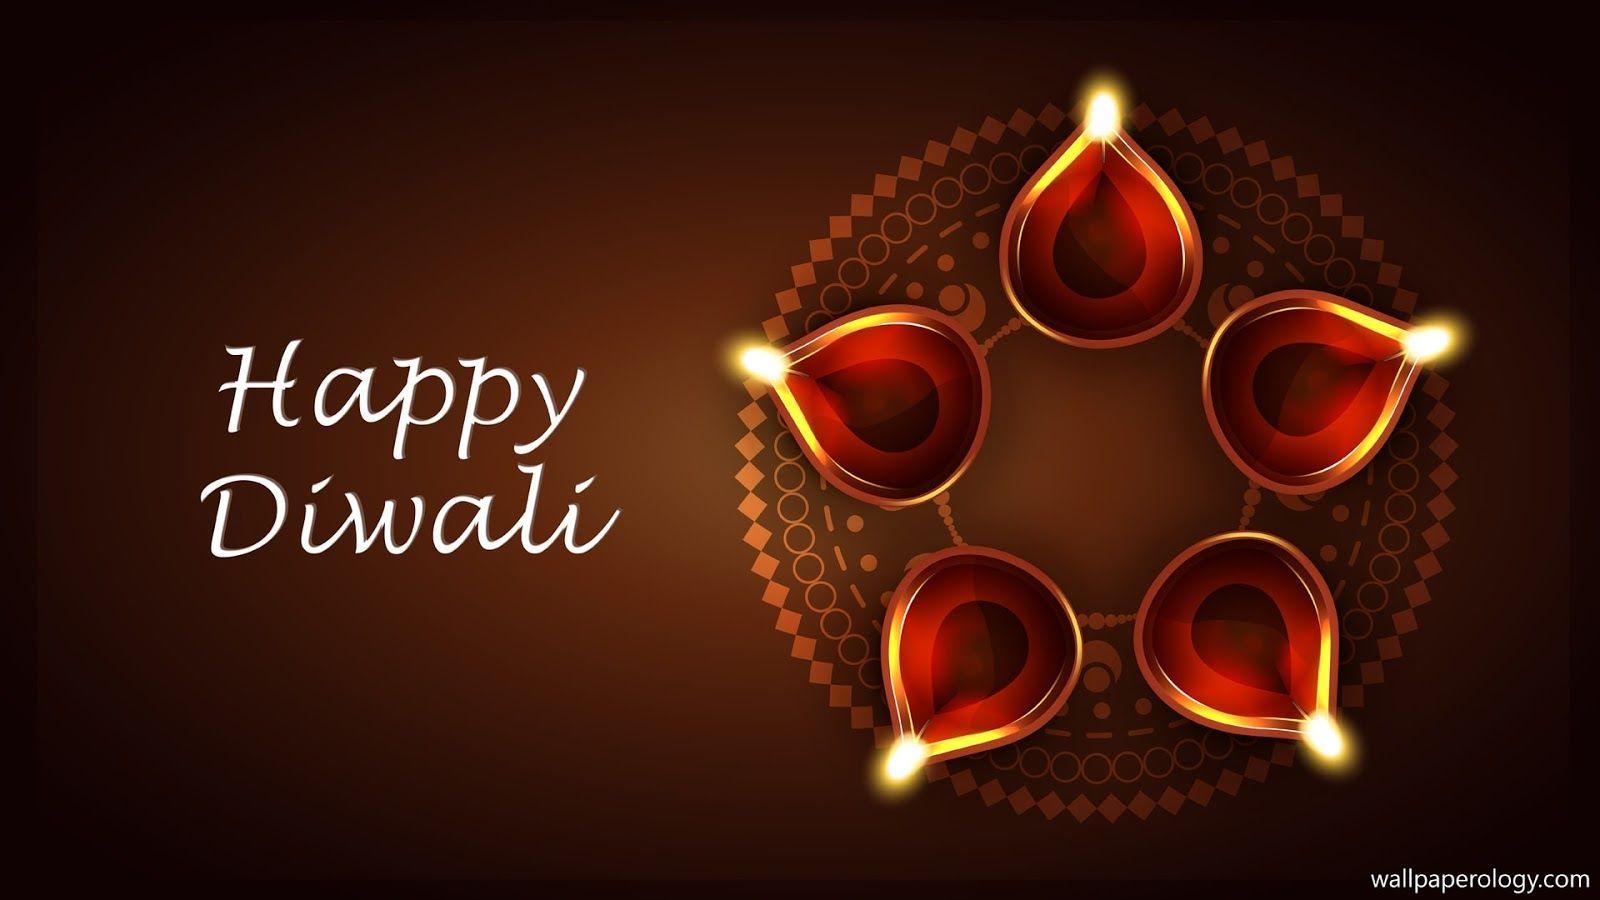 Pin On My Saves Happy diwali hd wallpaper download